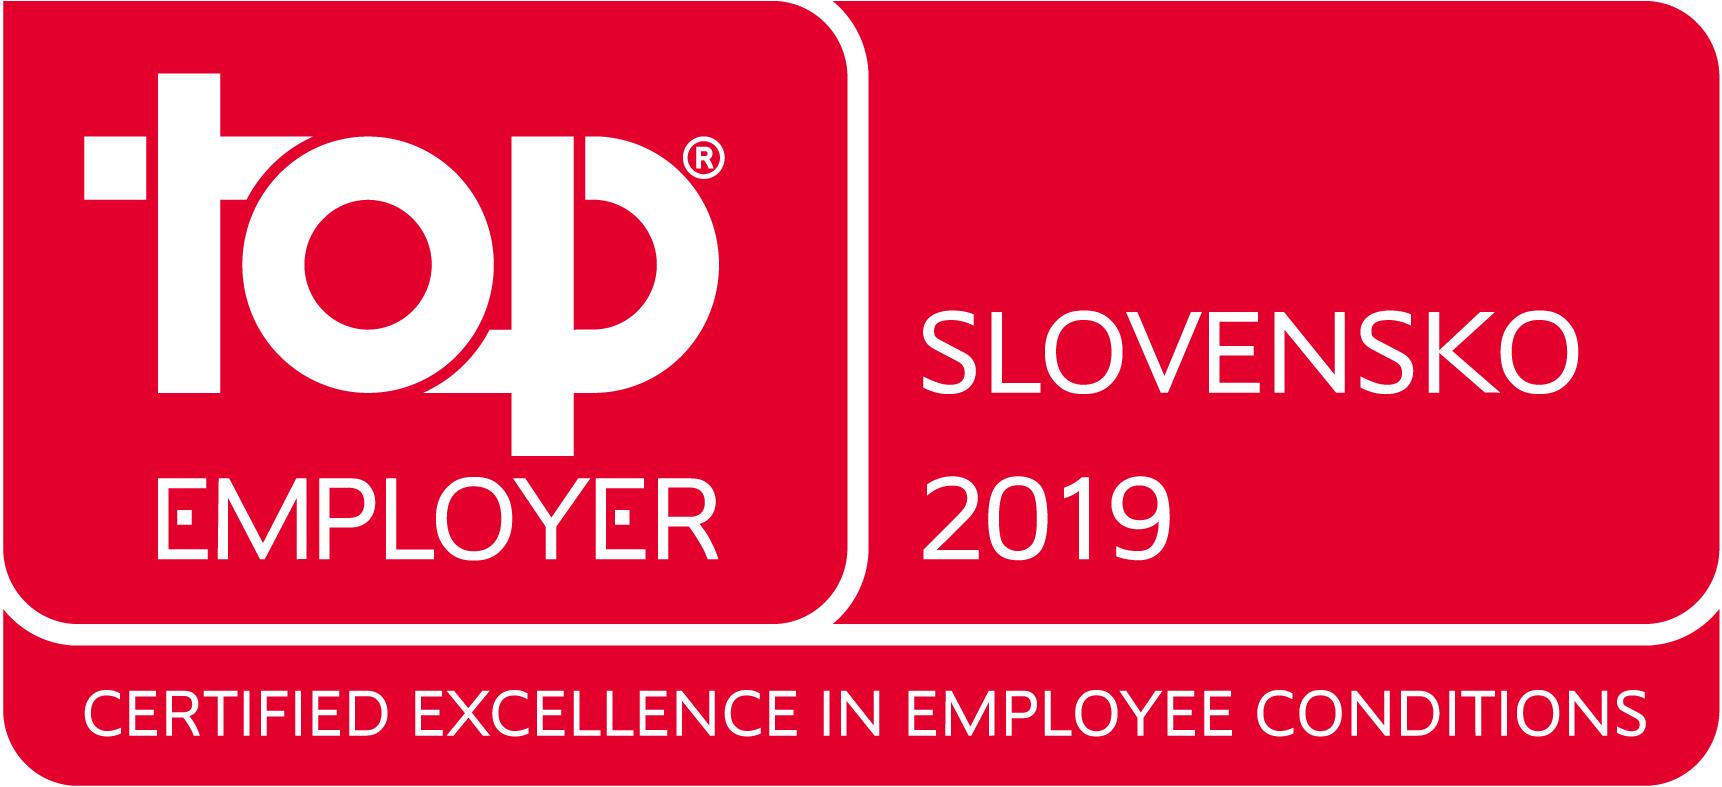 Top_Employer_Slovakia_2019